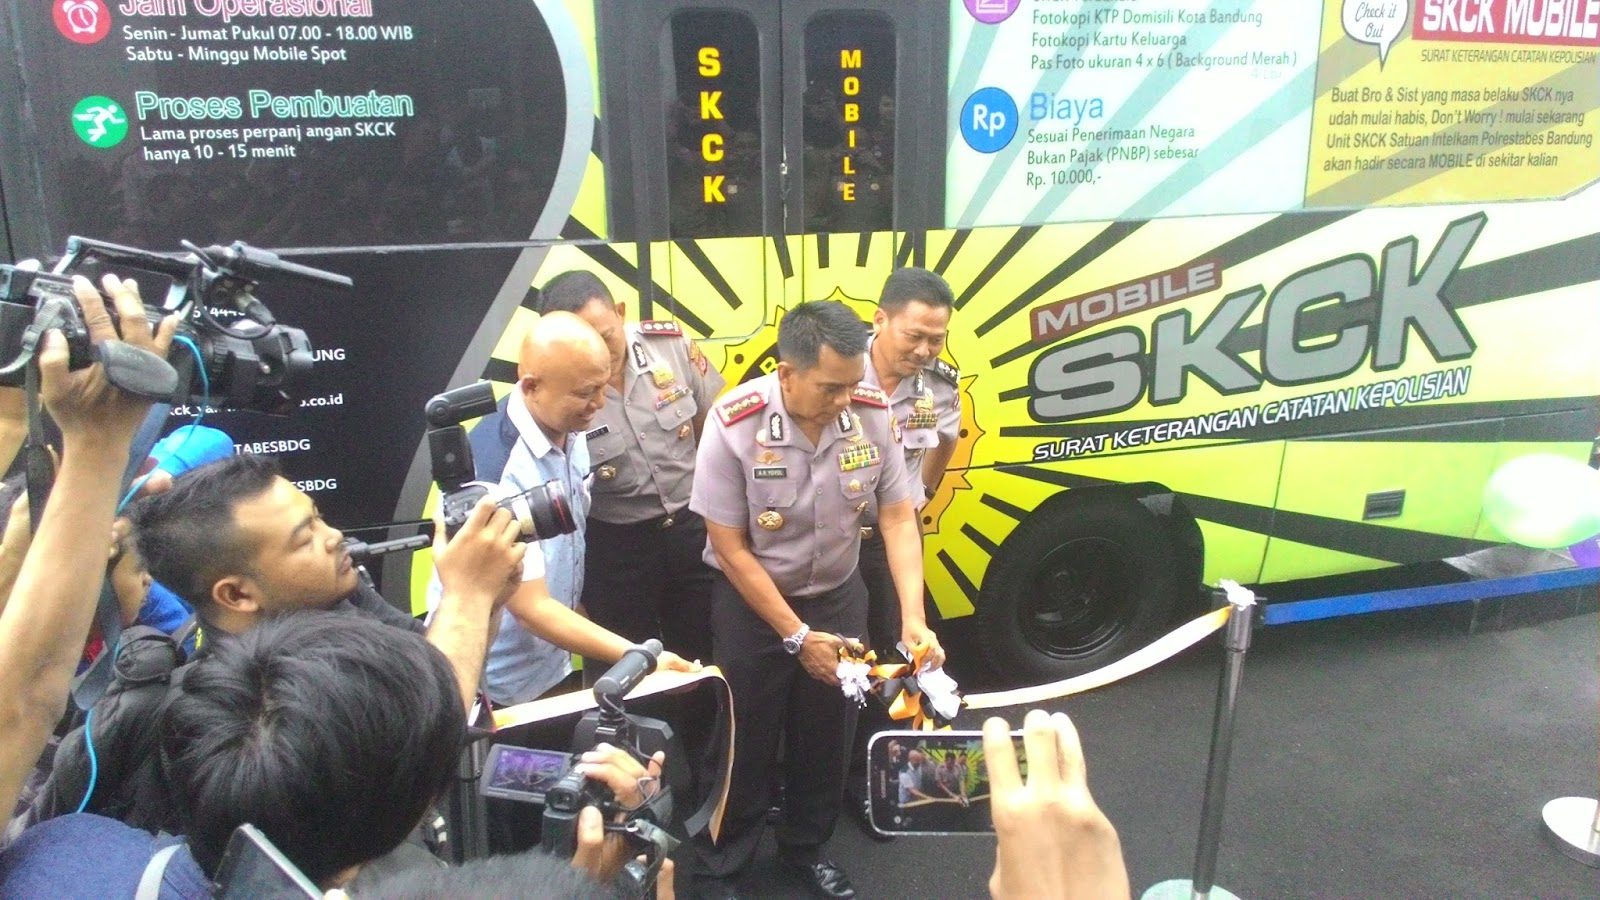 Polrestabes Kota Bandung Luncurkan Mobil Keliling Skck